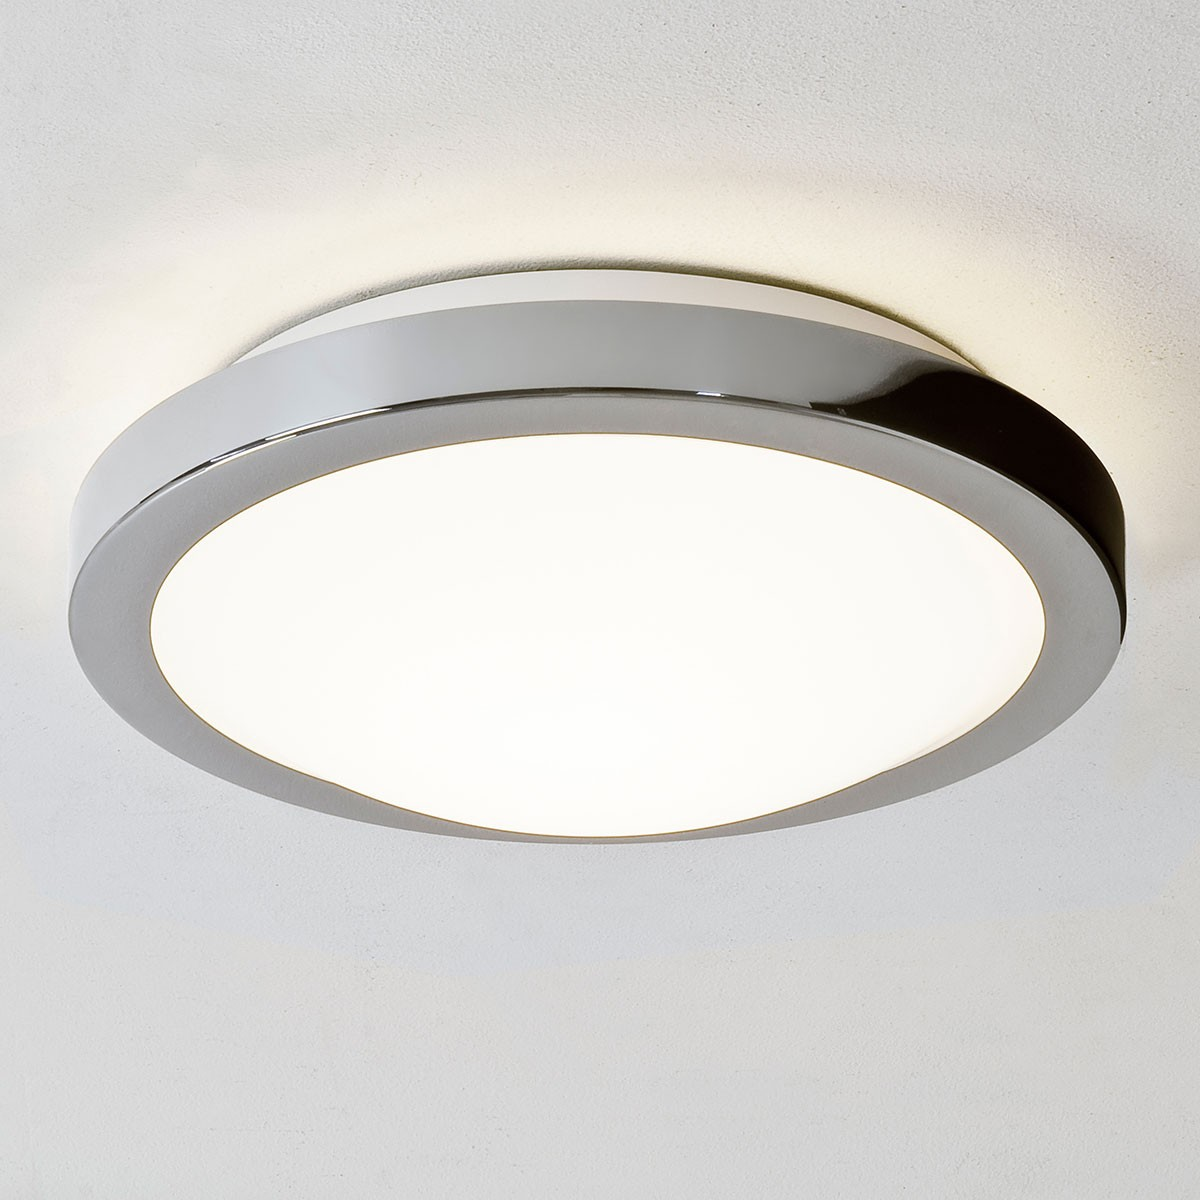 Ceiling Lights Chrome : Astro mariner polished chrome ceiling light at uk